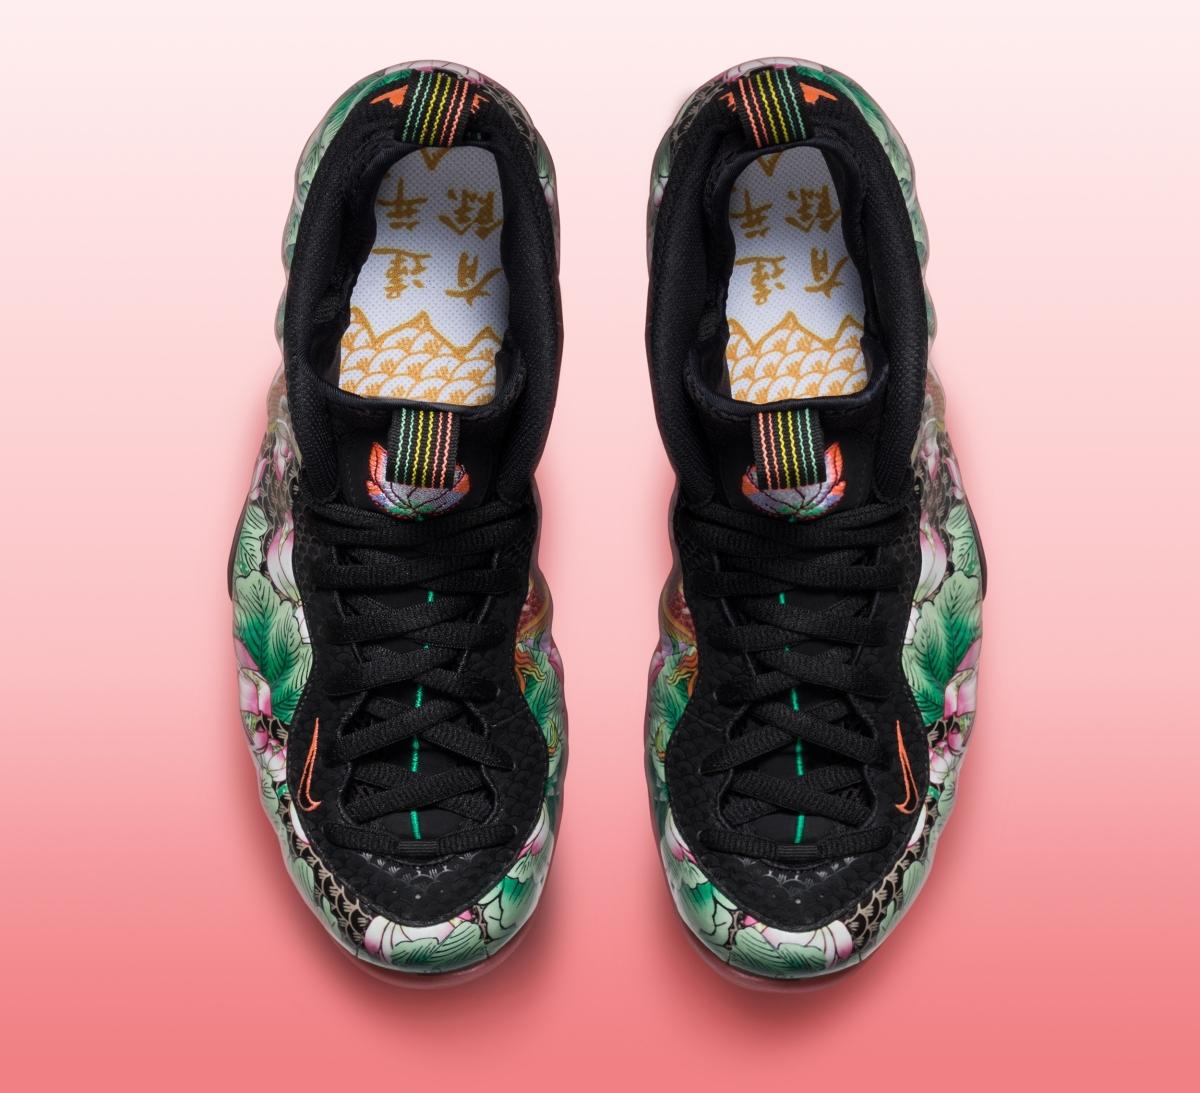 100% authentic 8a077 7082a  Tianjin  Nike Foamposites Releasing Next Week